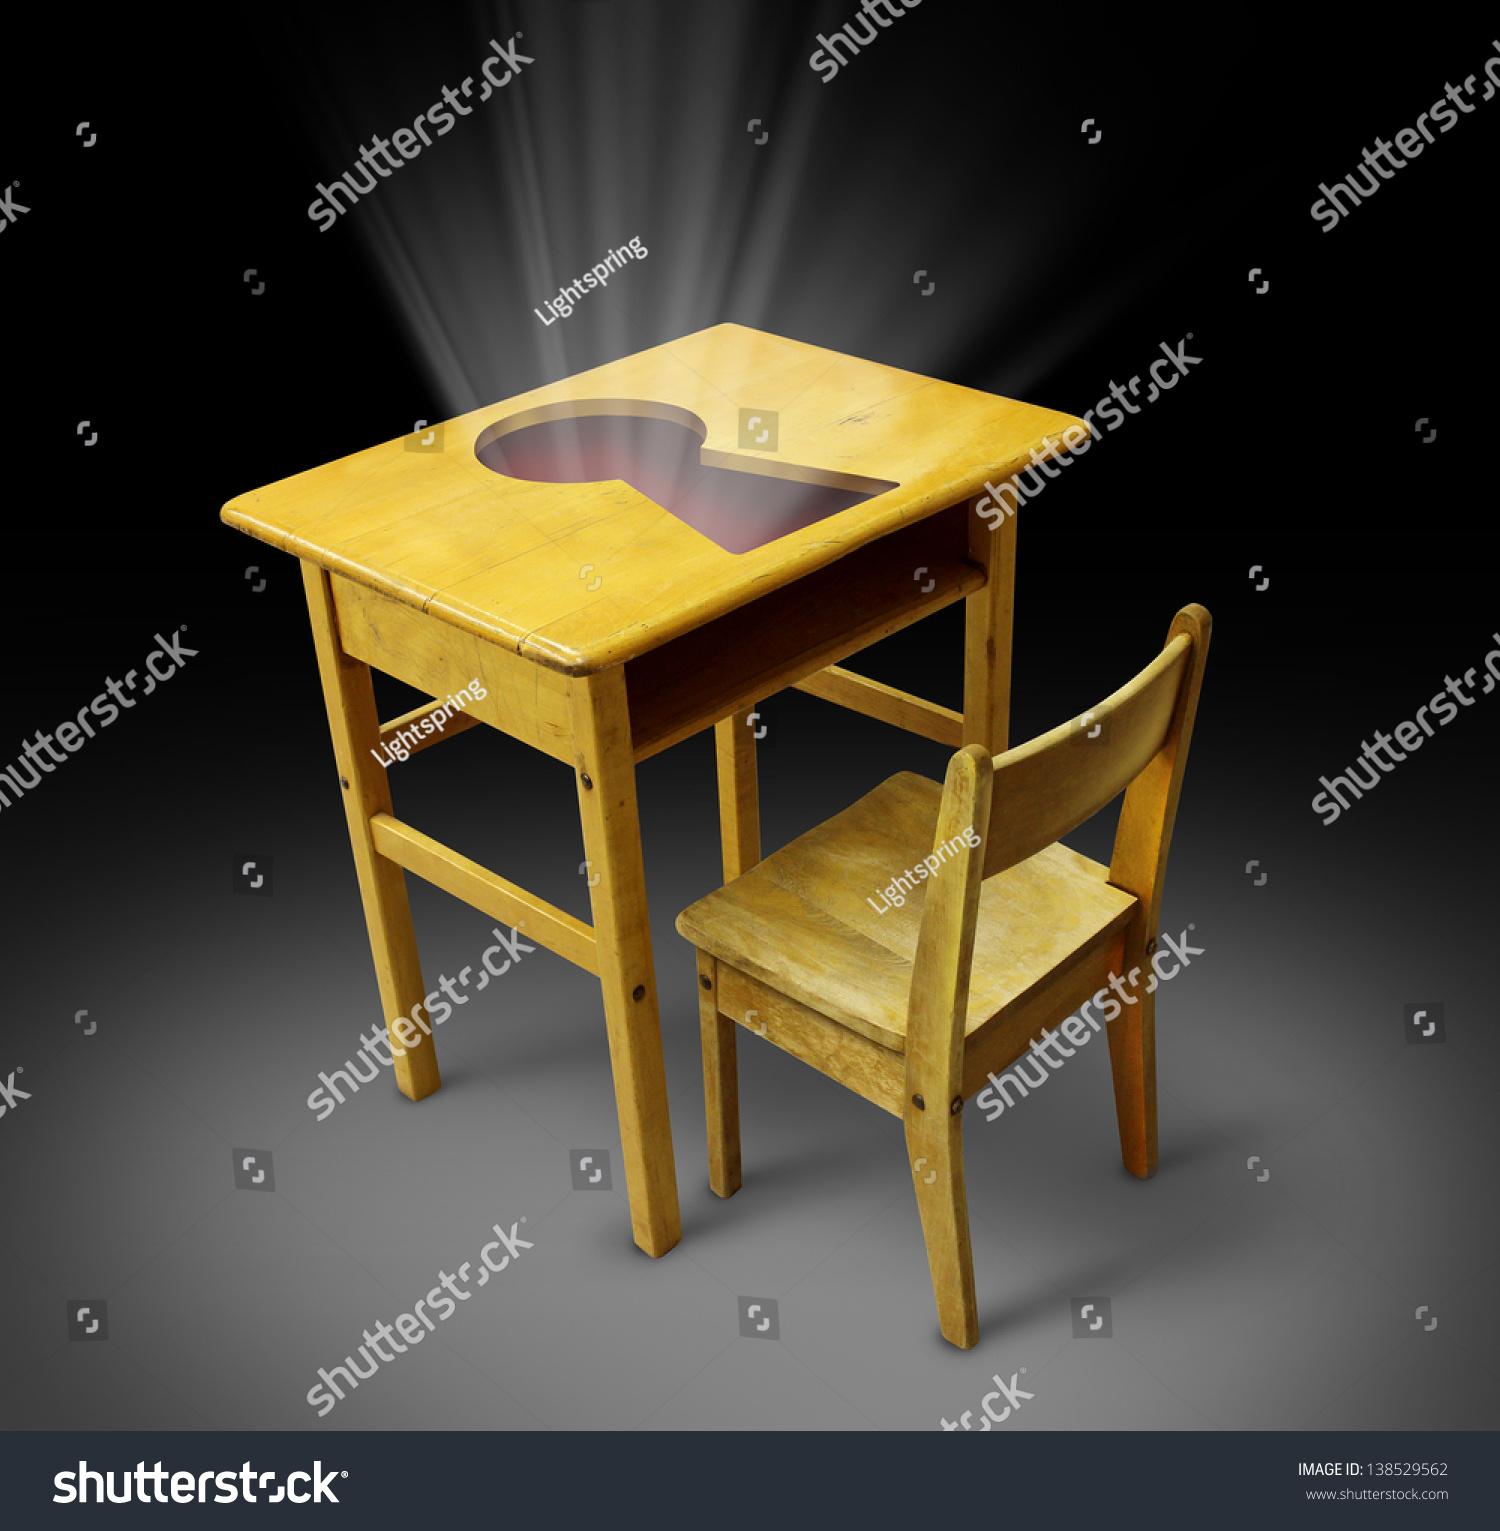 Key Education Concept Old School Desk Stock Illustration